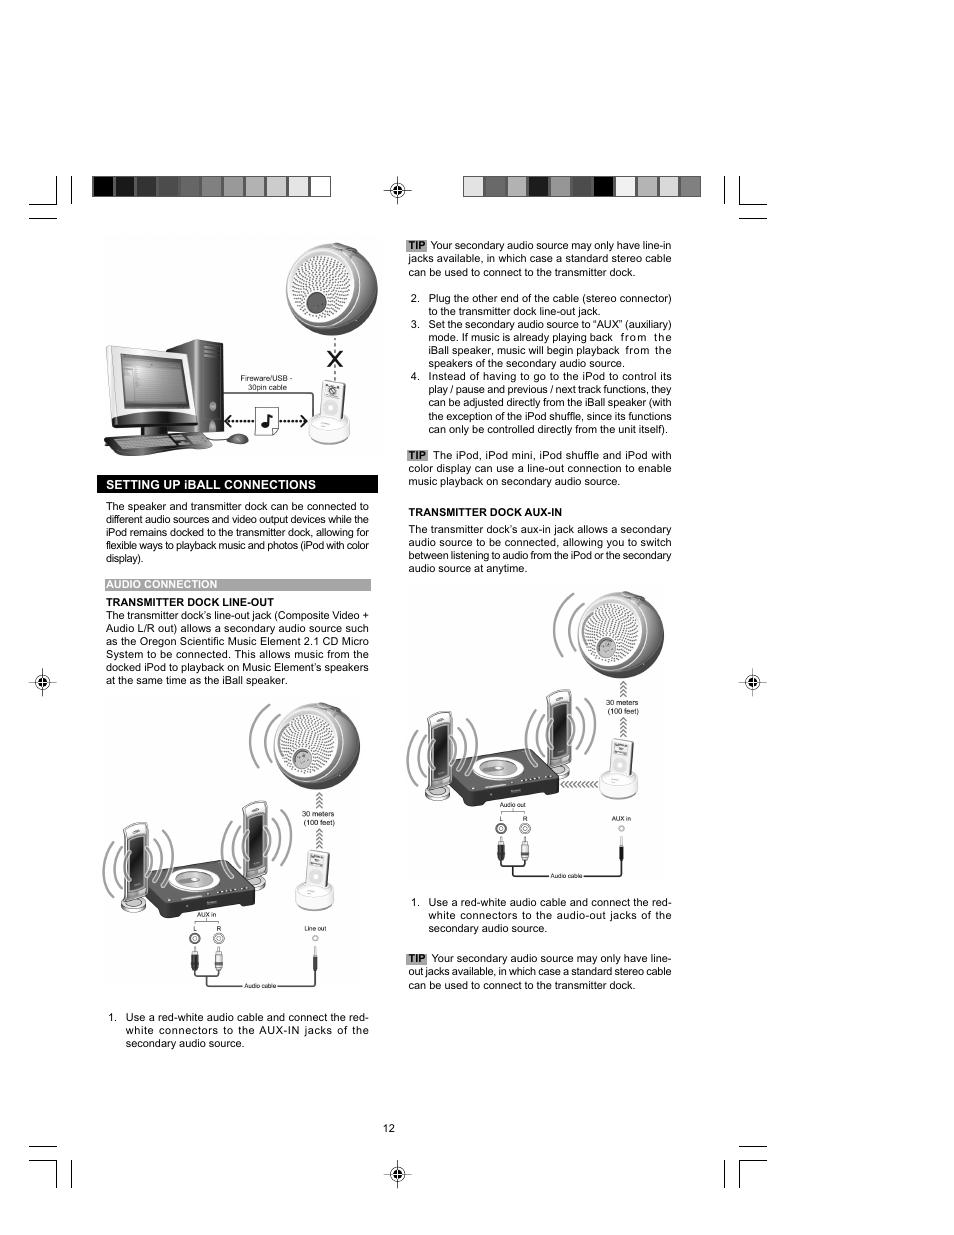 Oregon Scientific Ib368 User Manual Page 12 18 Original Mode 30 Pin Ipod Cable To Usb Wire Schematic